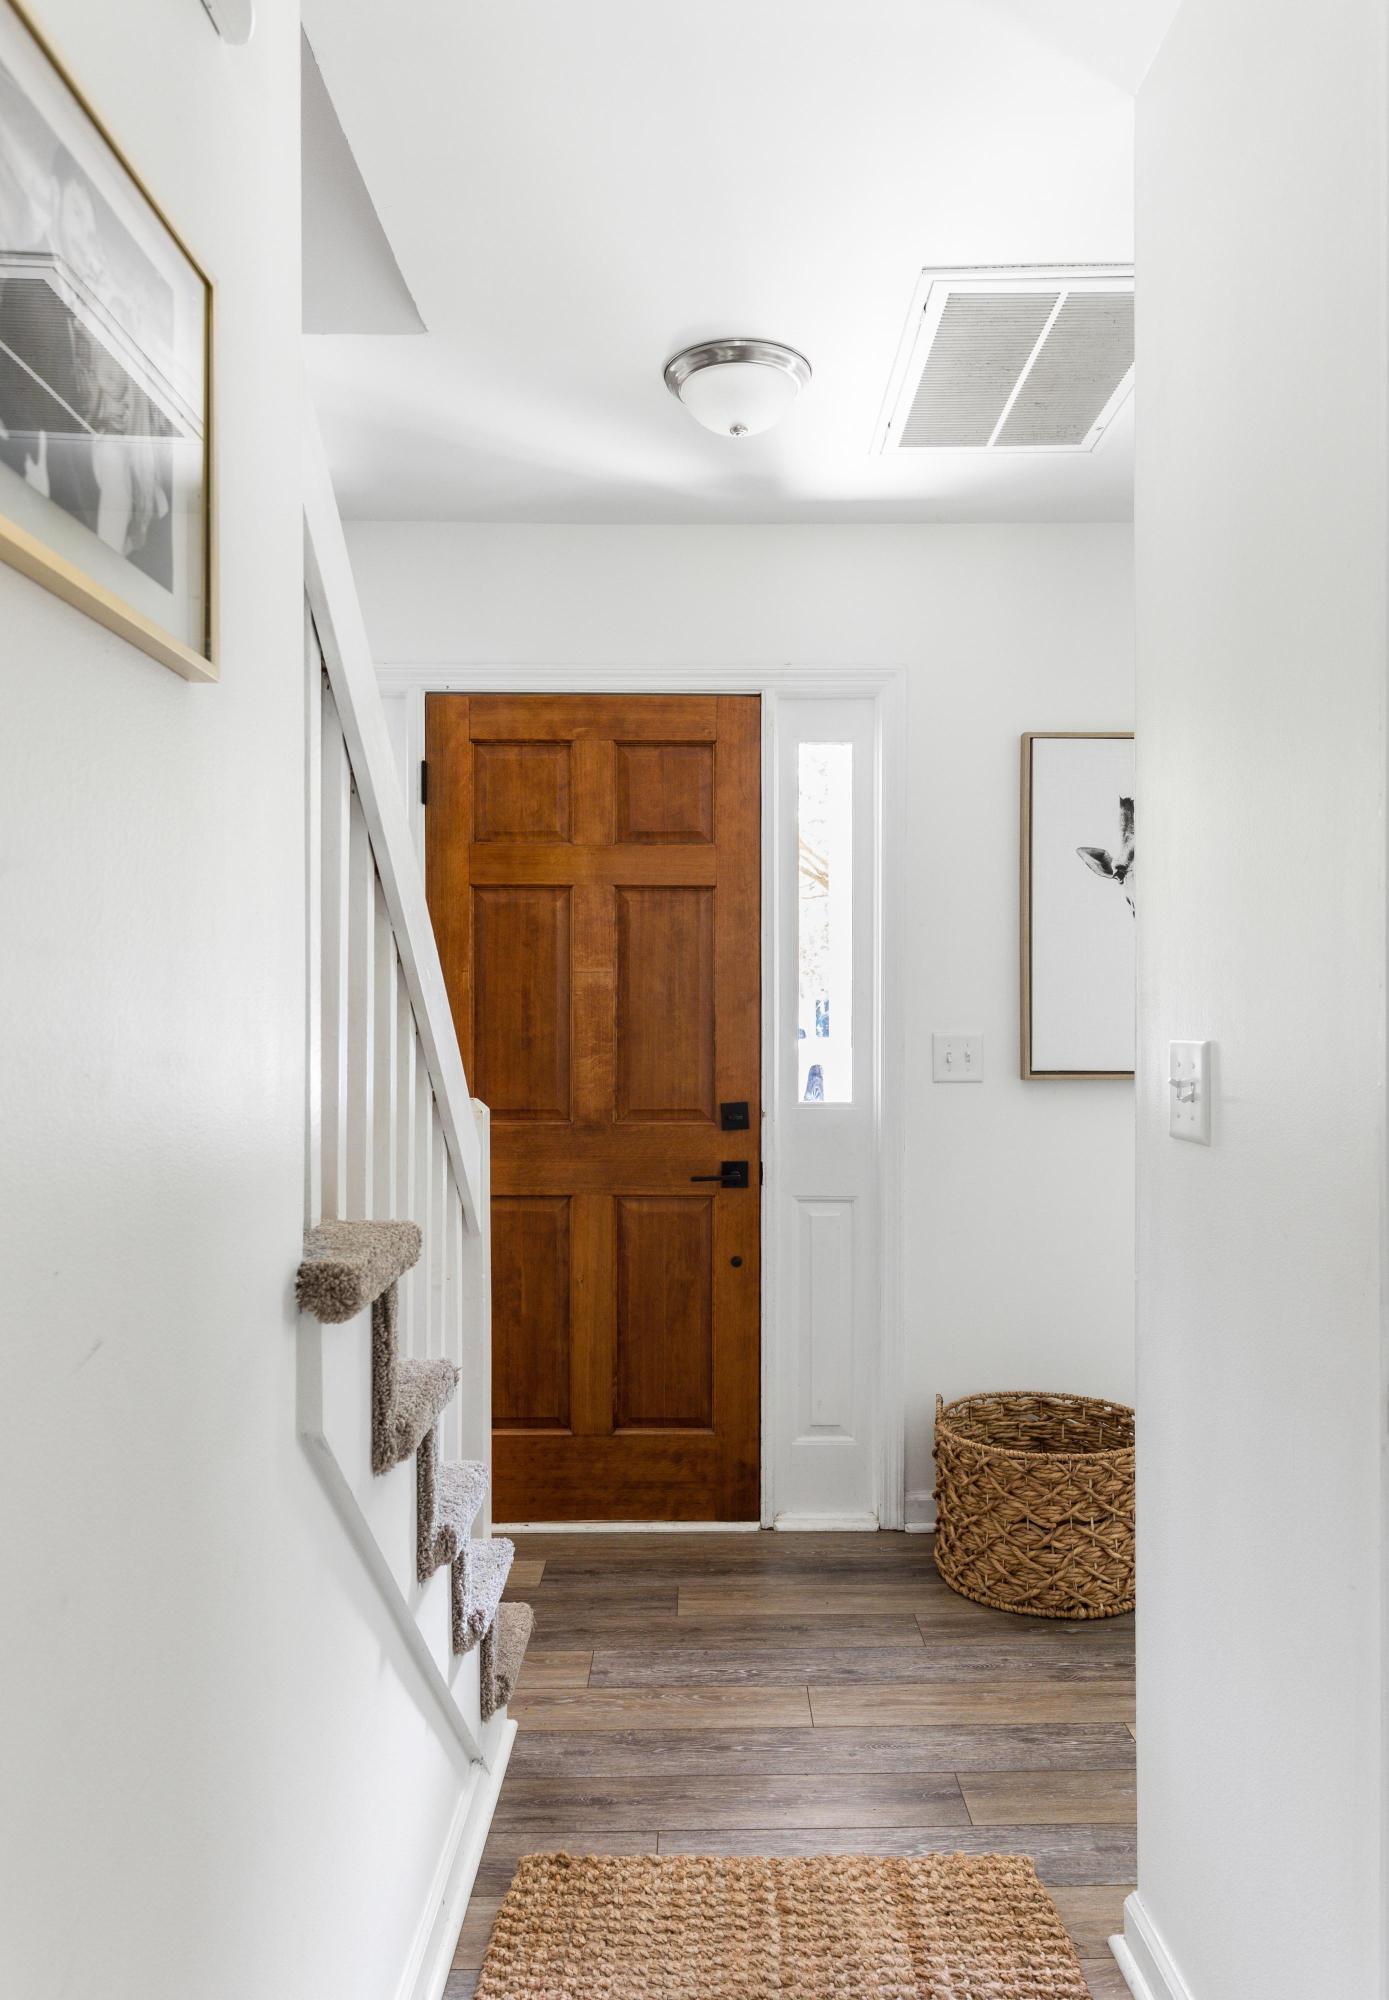 Snee Farm Homes For Sale - 1137 Shady Grove, Mount Pleasant, SC - 1